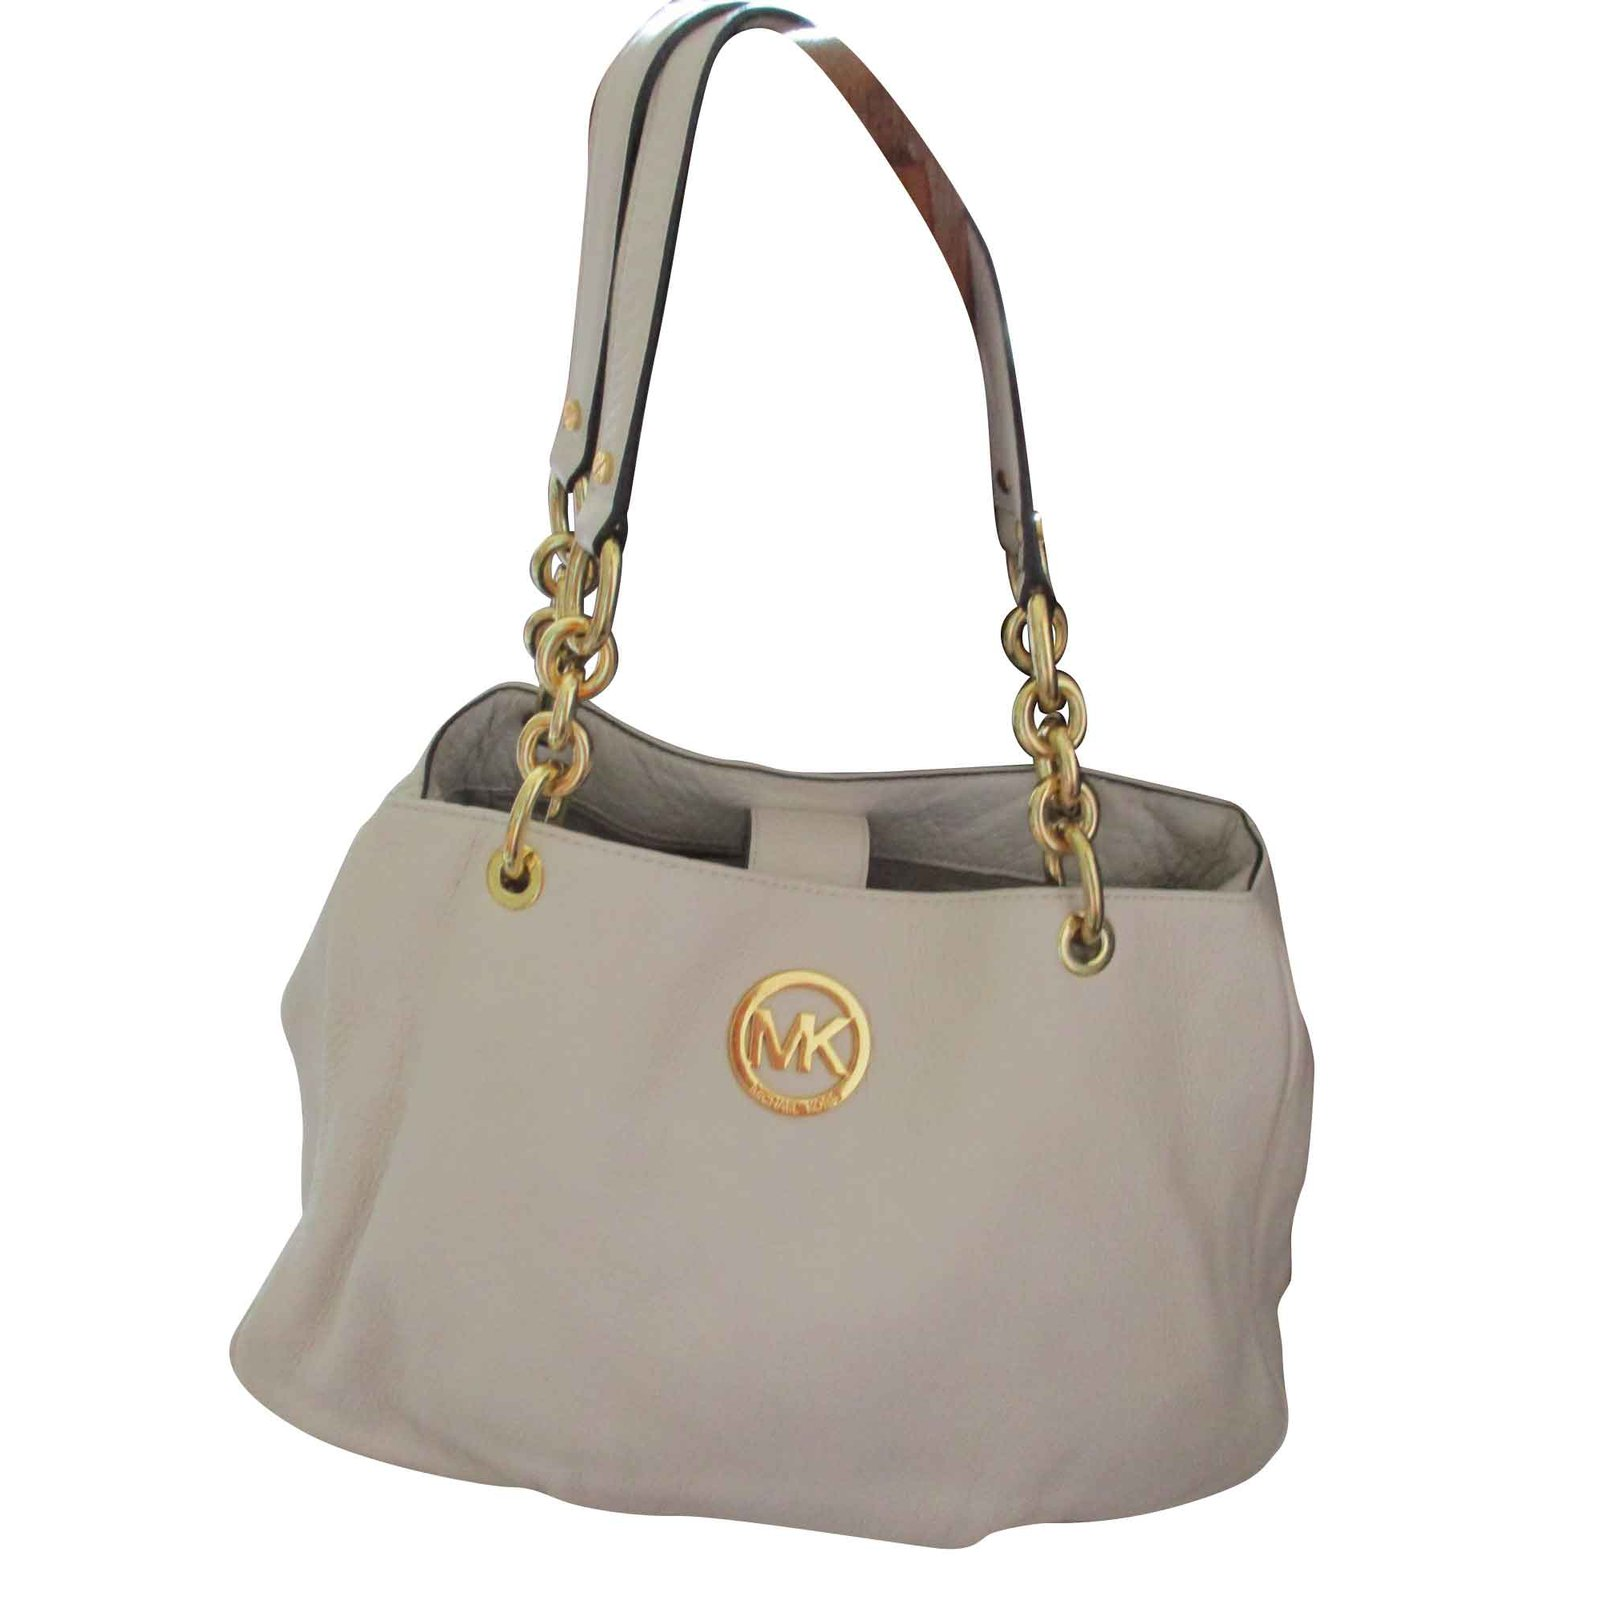 9469d1de96f6 Michael Kors Fulton Chain Tote Vanilla Color Leather Handbags Leather Beige  ref.93465